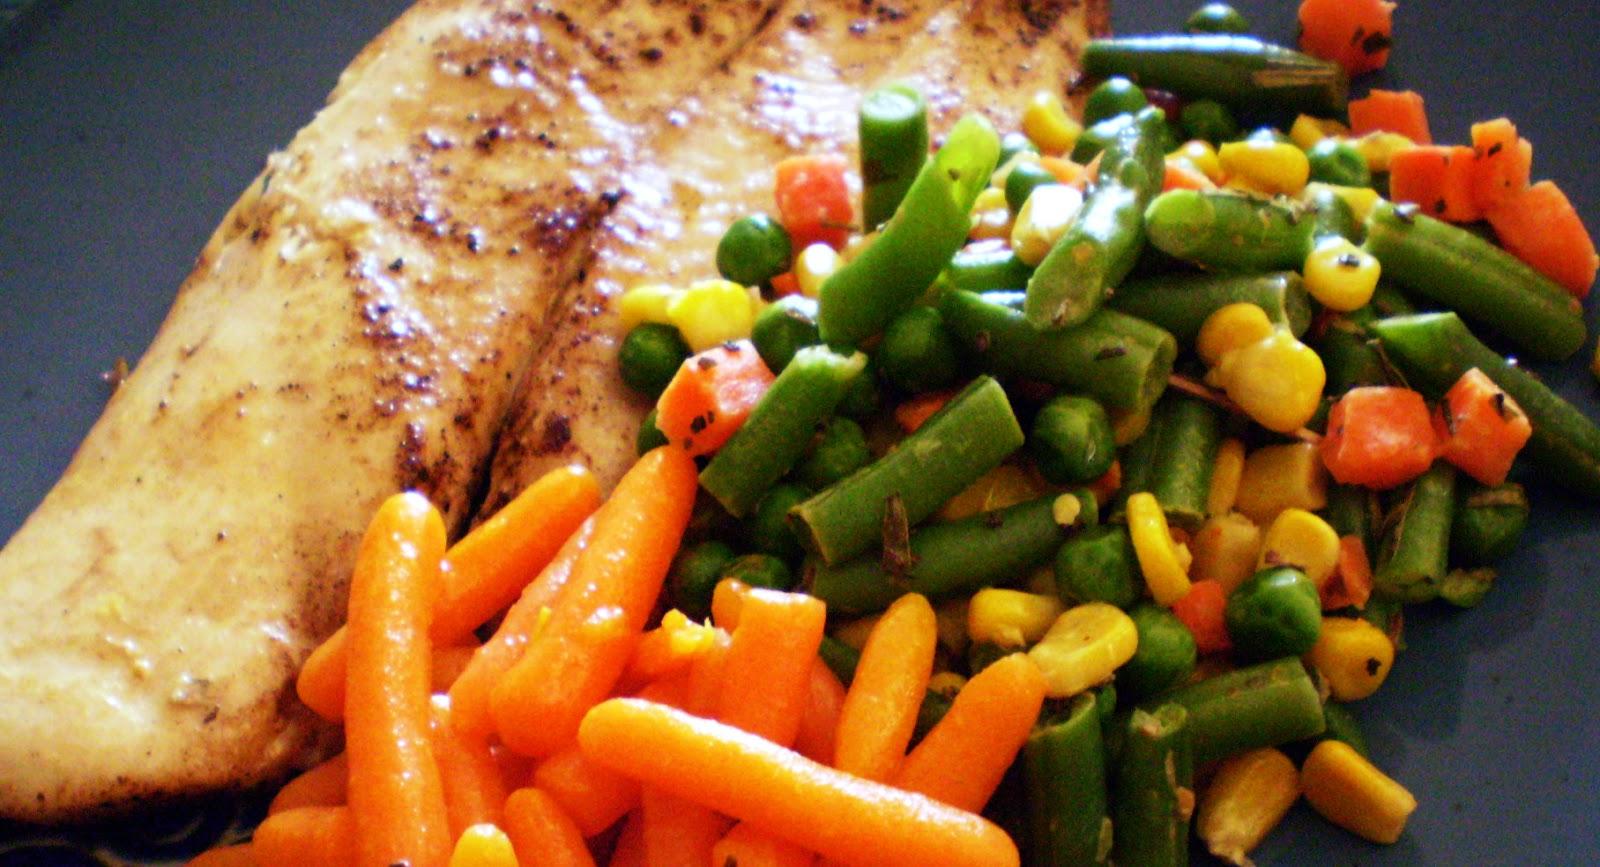 Cocina de coraz n reineta a la mantequilla negra con for Que cocinar con verduras